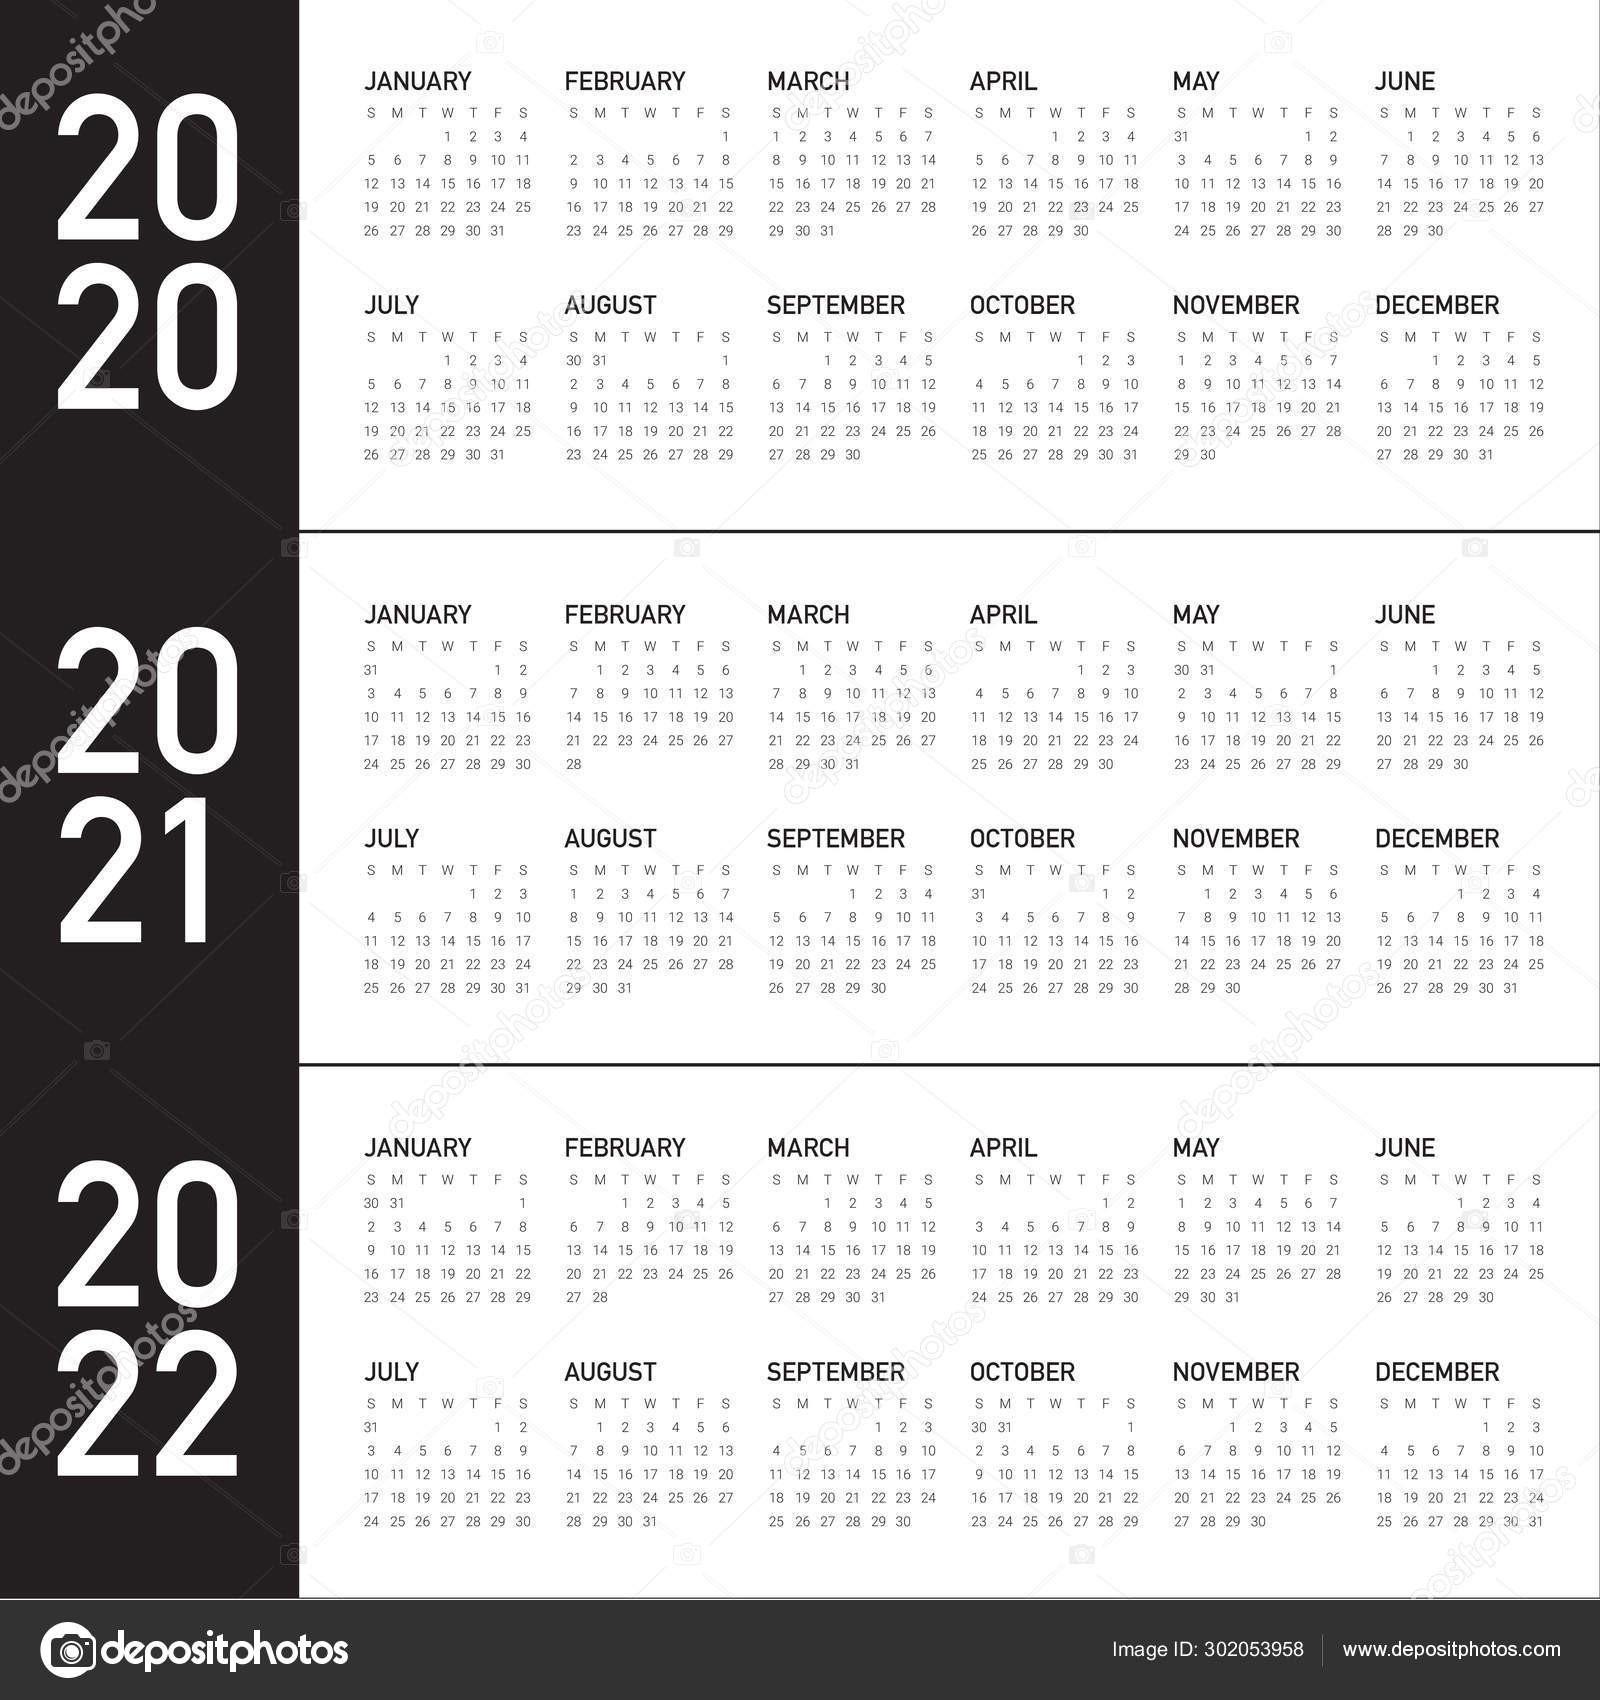 Depo Calendar 2021 - Template Calendar Design